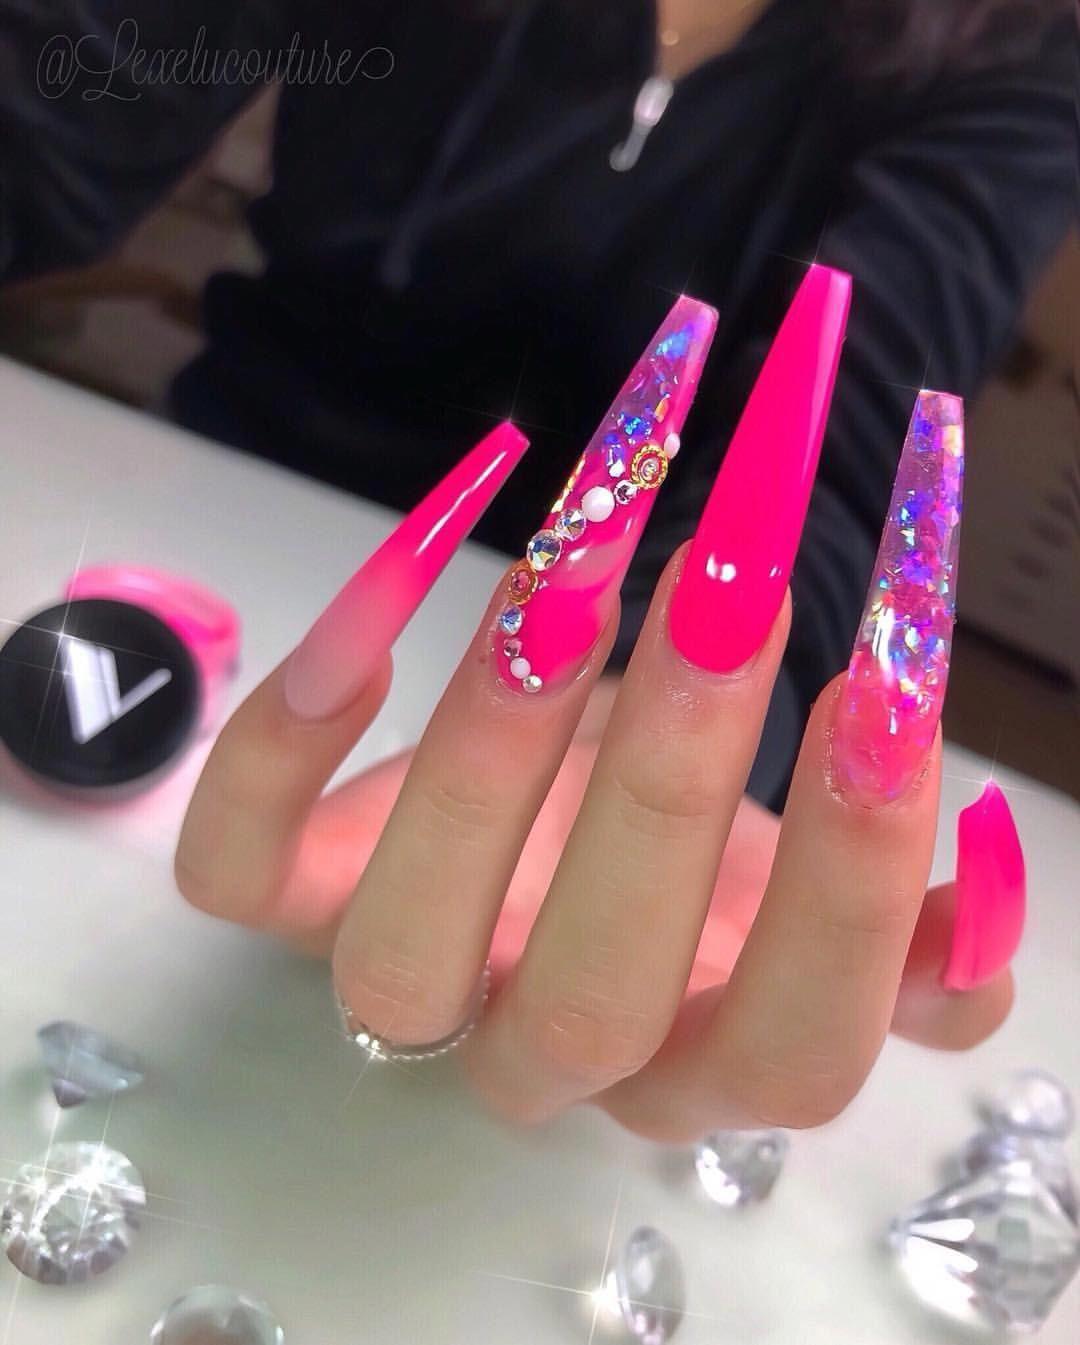 #frenchnails #beautiful #perfect #nails #swarovski #ombre